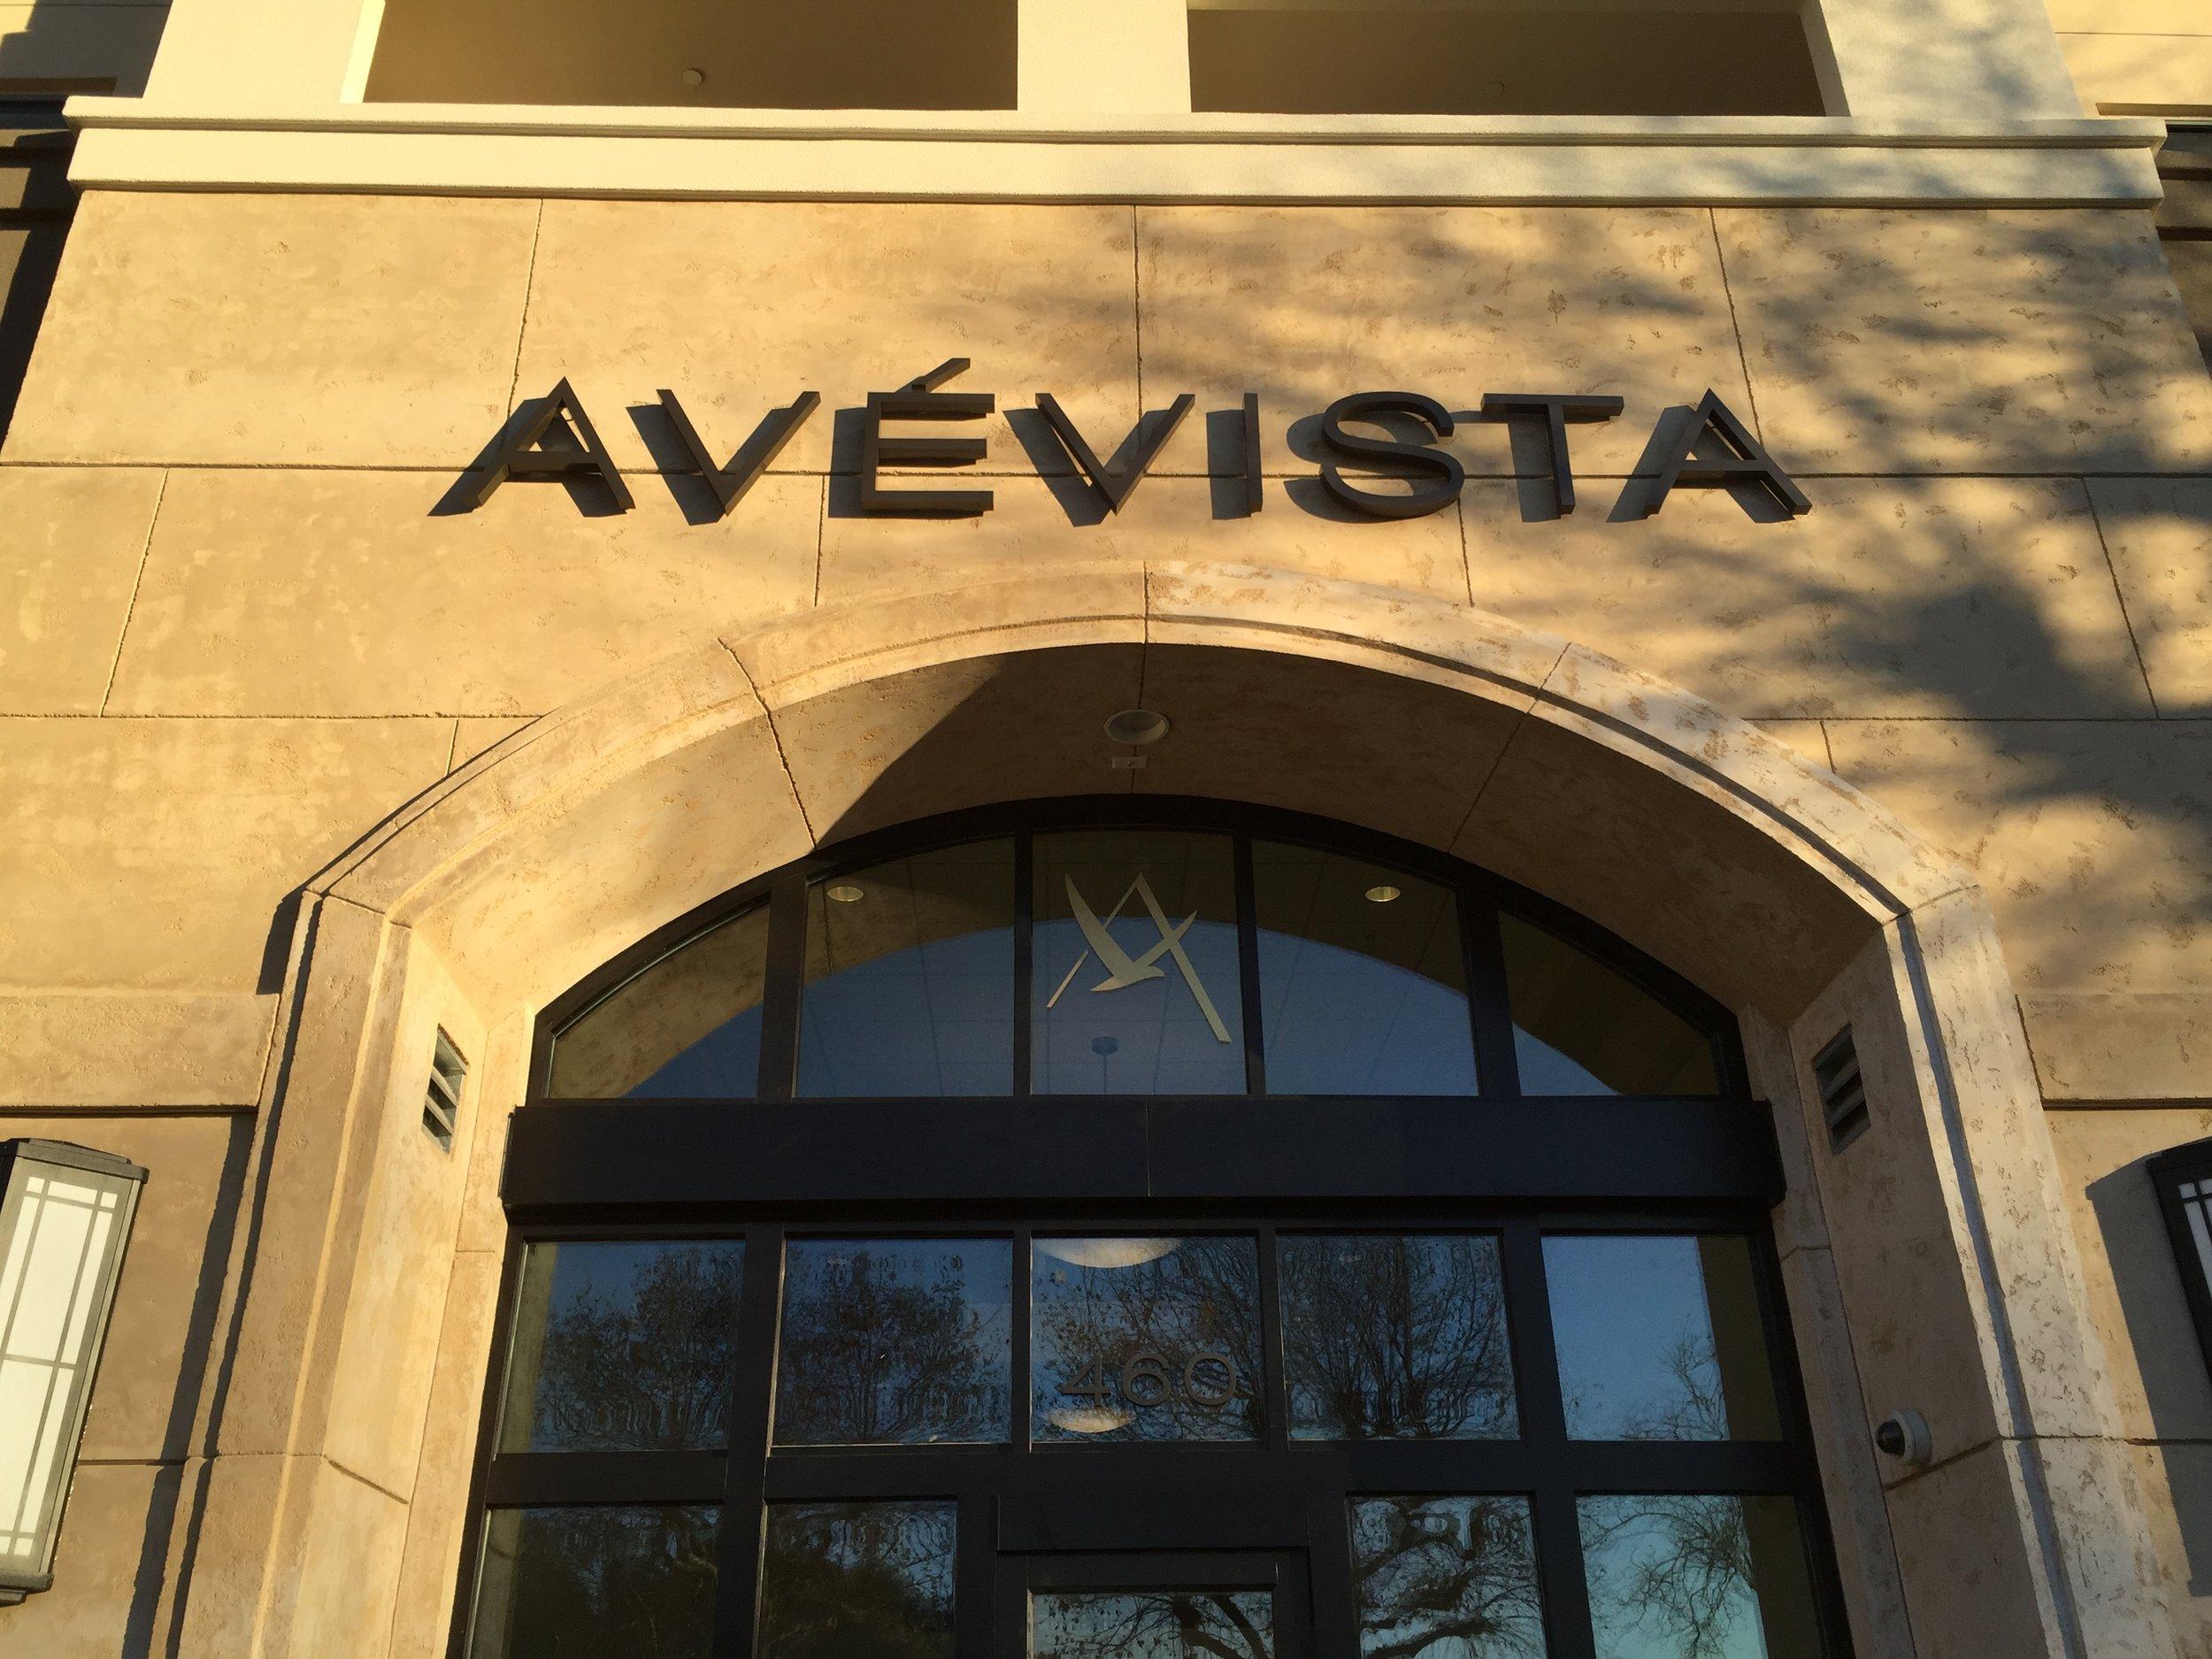 Ave Vista